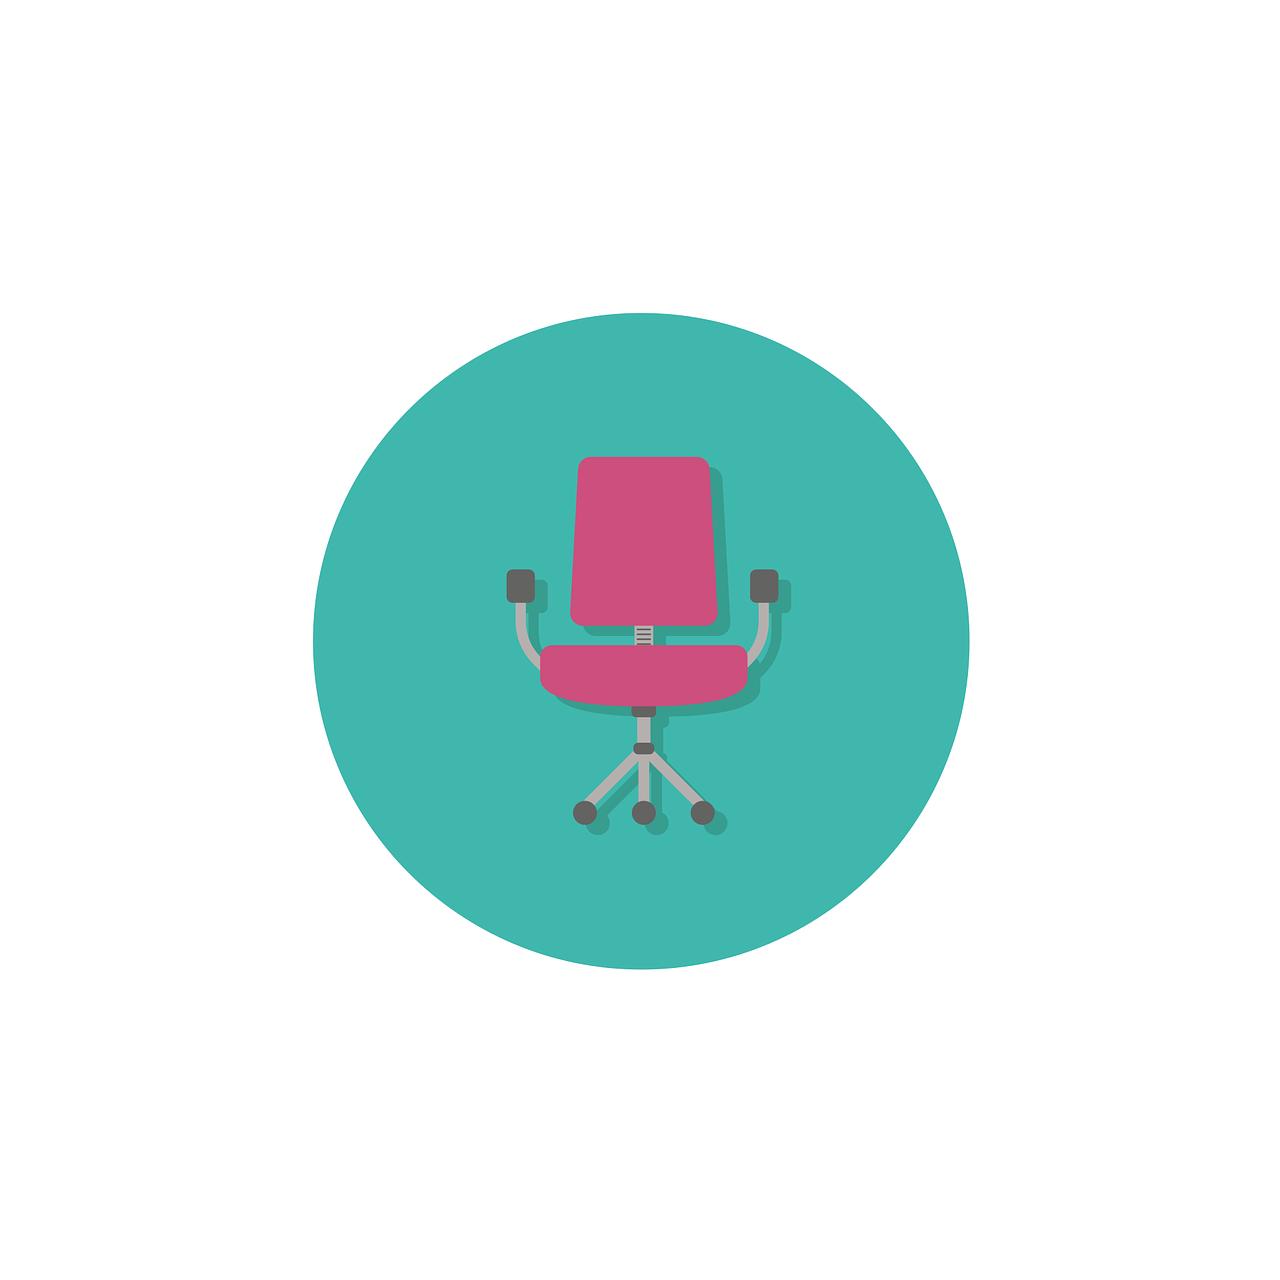 desk, chair, icon